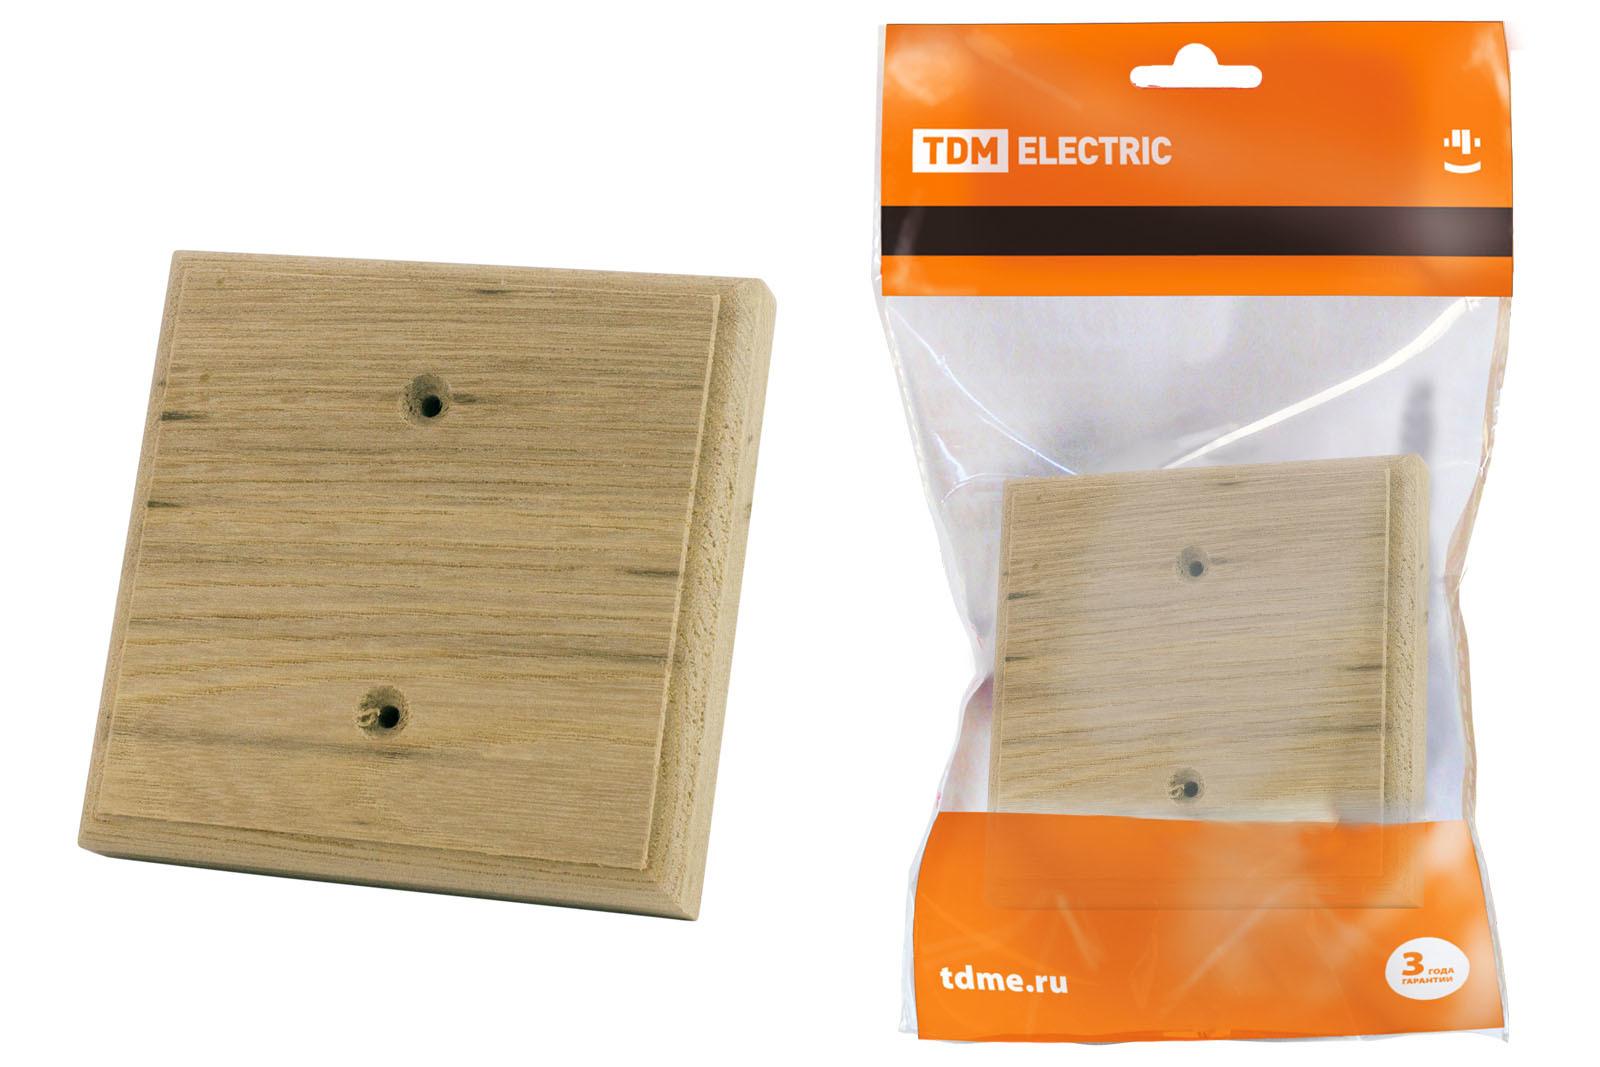 Накладка на бревно деревянная универсальная НБУ 1П 95х95 мм, под покраску TDM